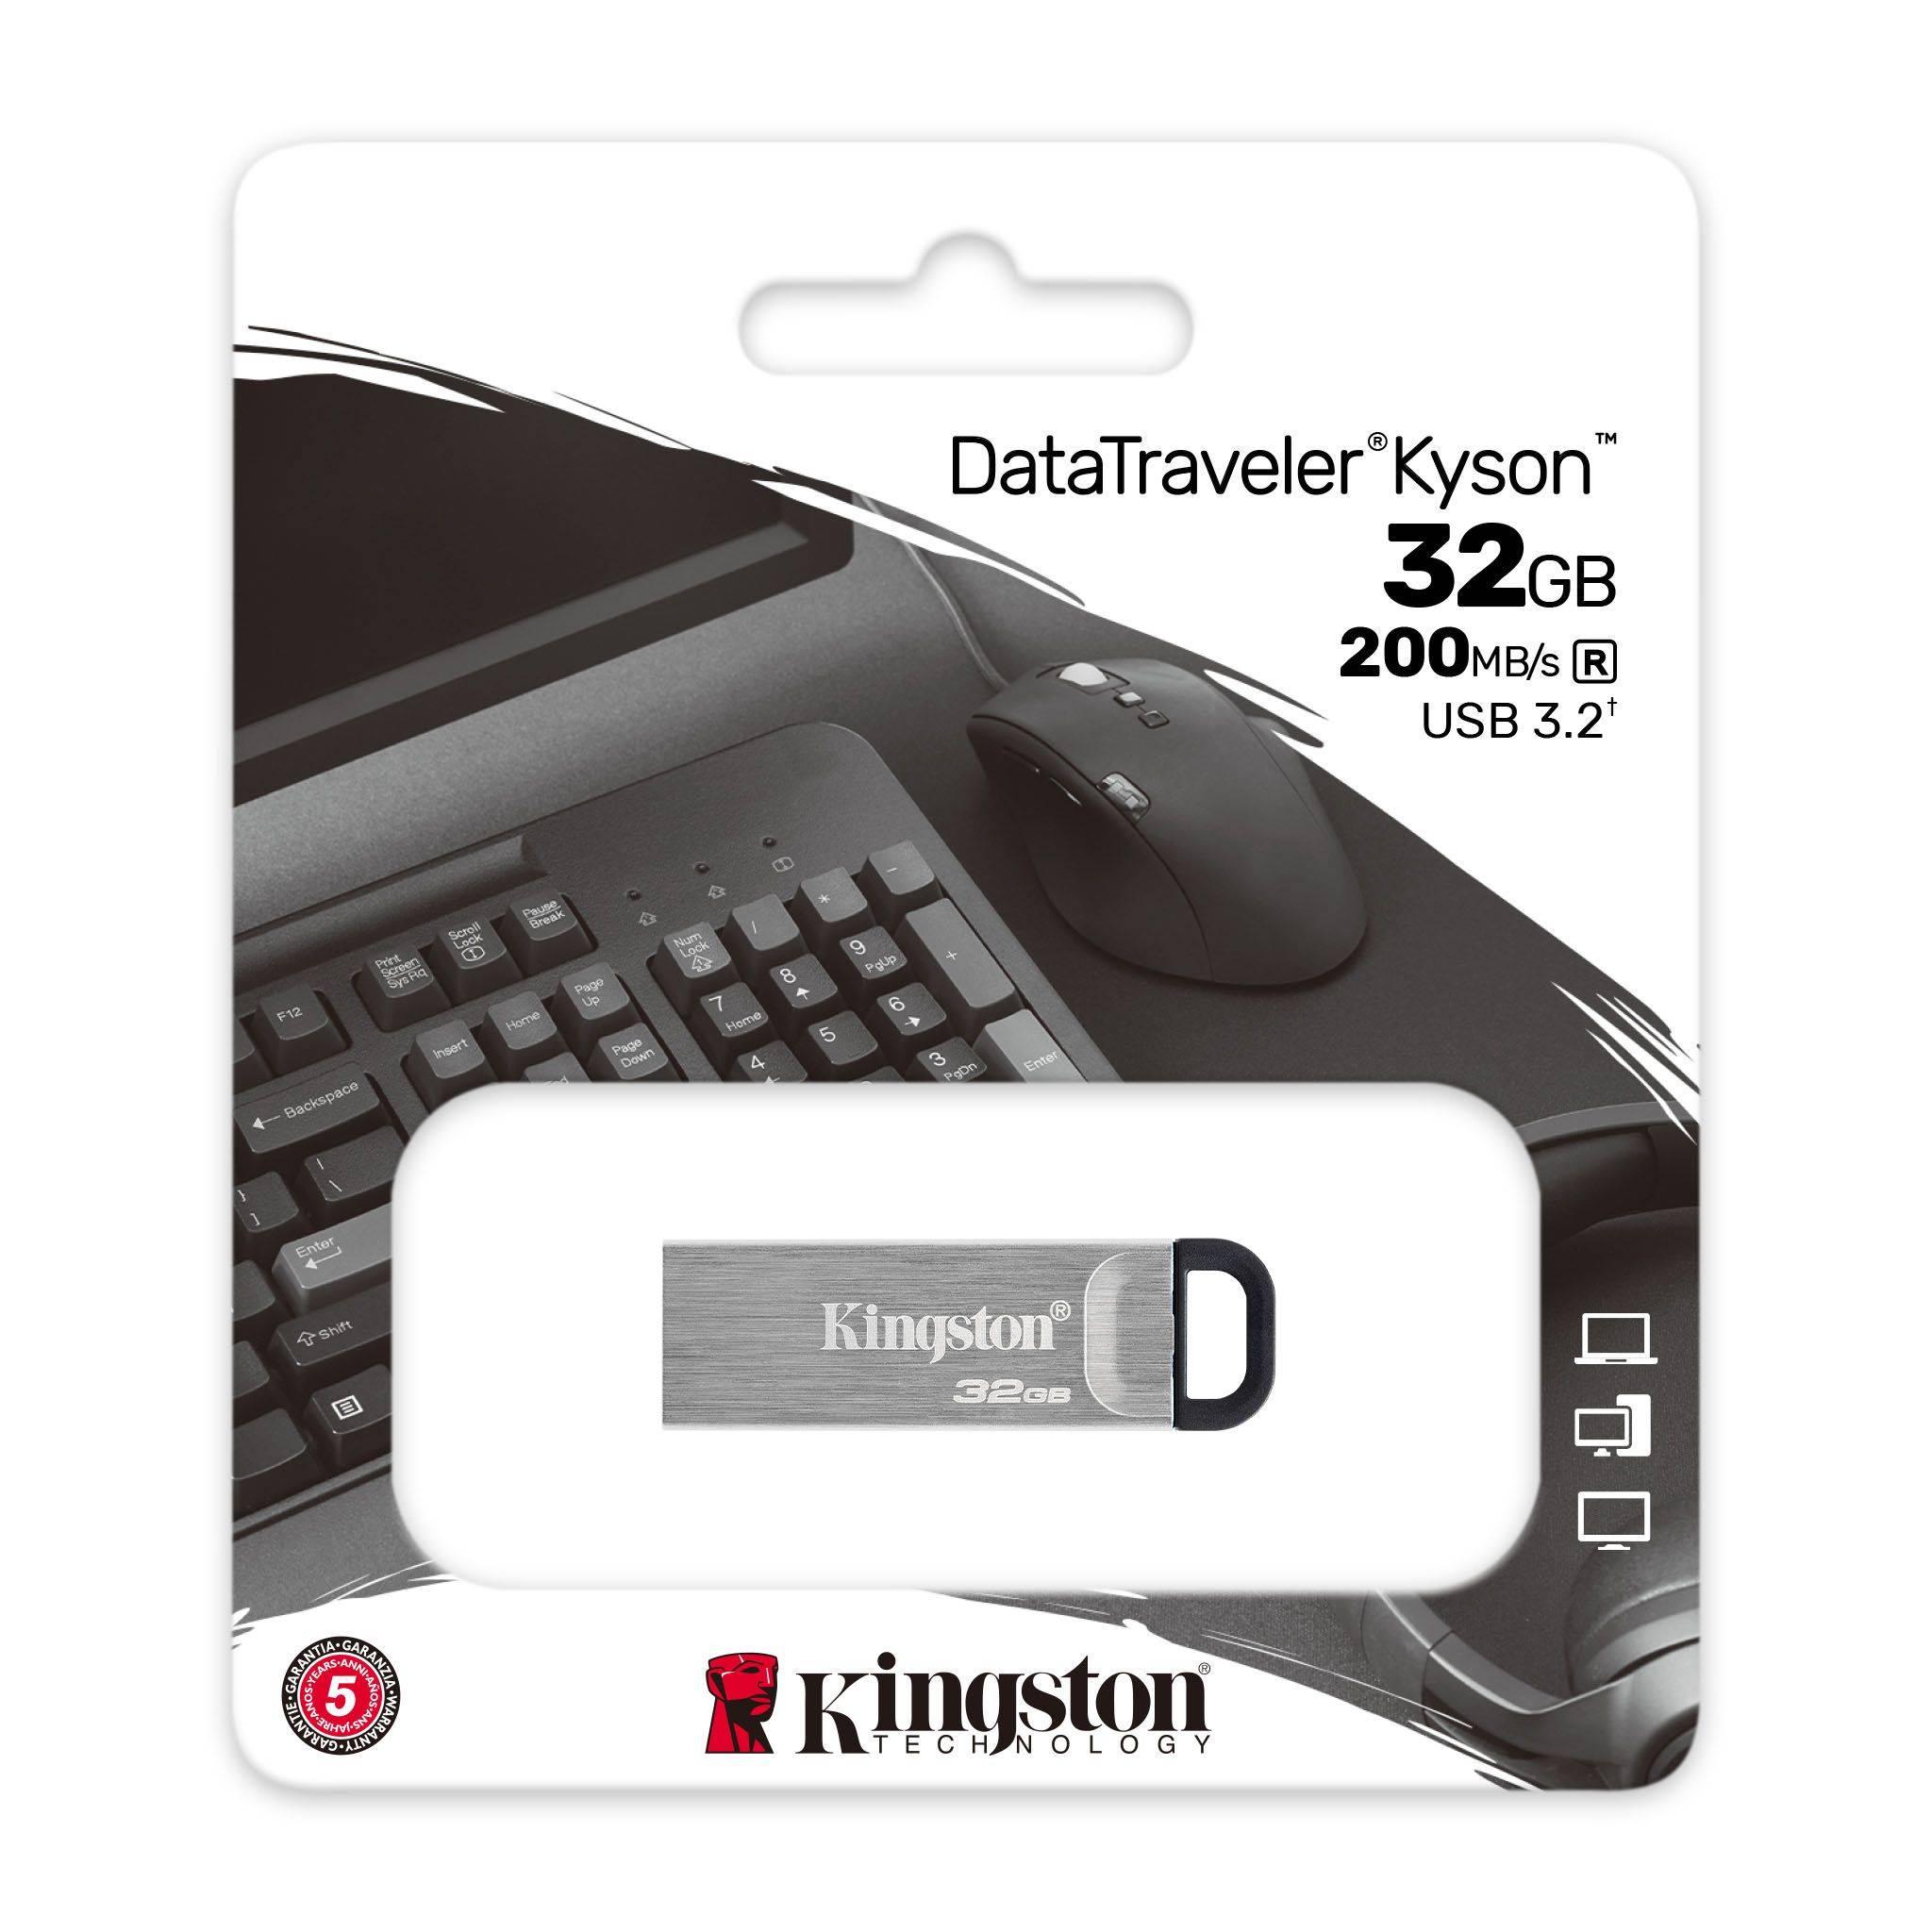 Kingston USB 3.0 Flash Drive 32GB with Stylish Capless Metal Case DTKN/32G